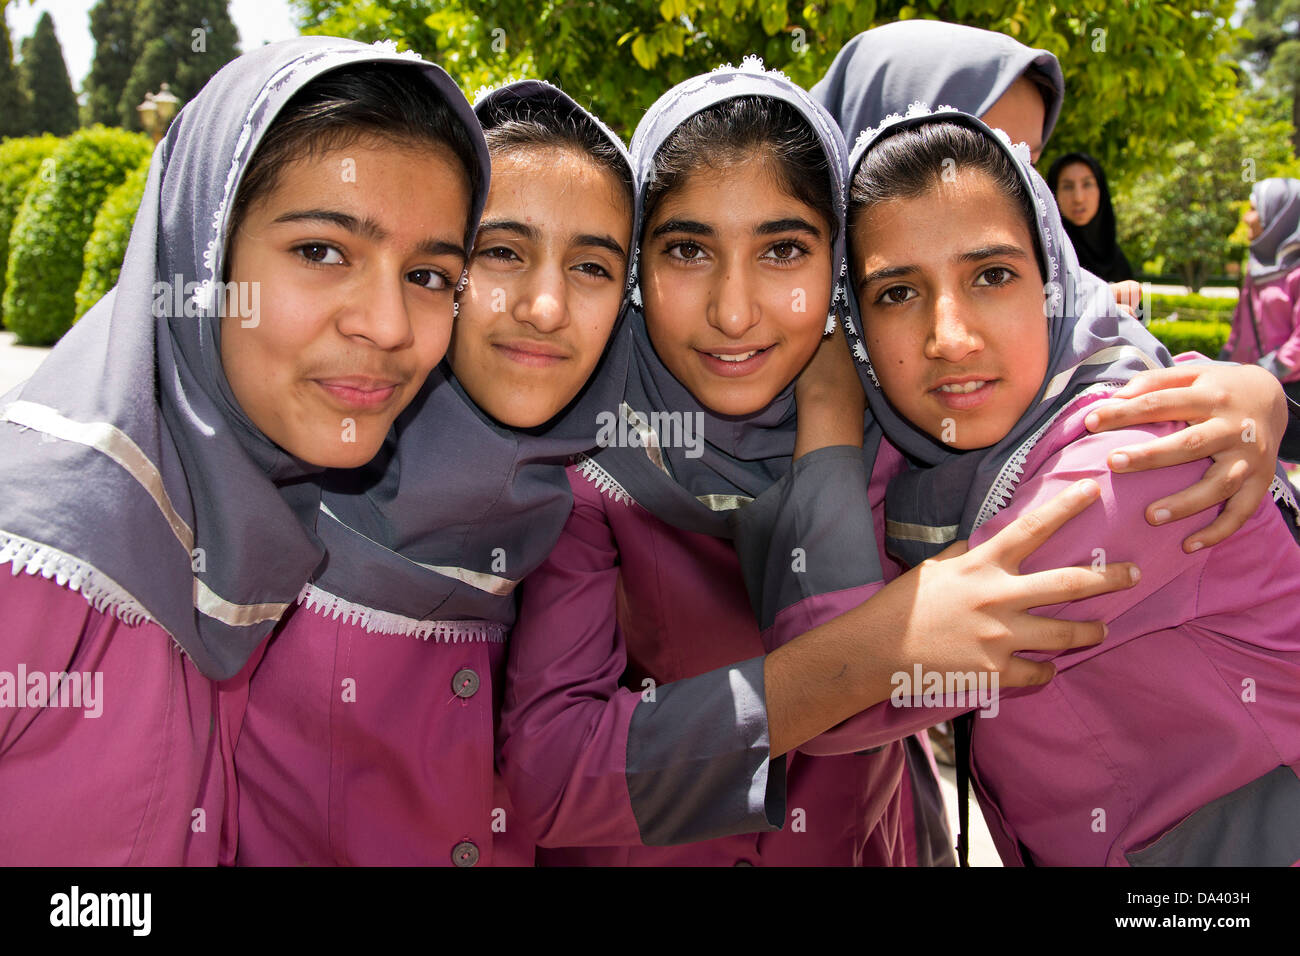 Asia, Iran, Shiraz, Eram And Nerejestan Garden, Girls